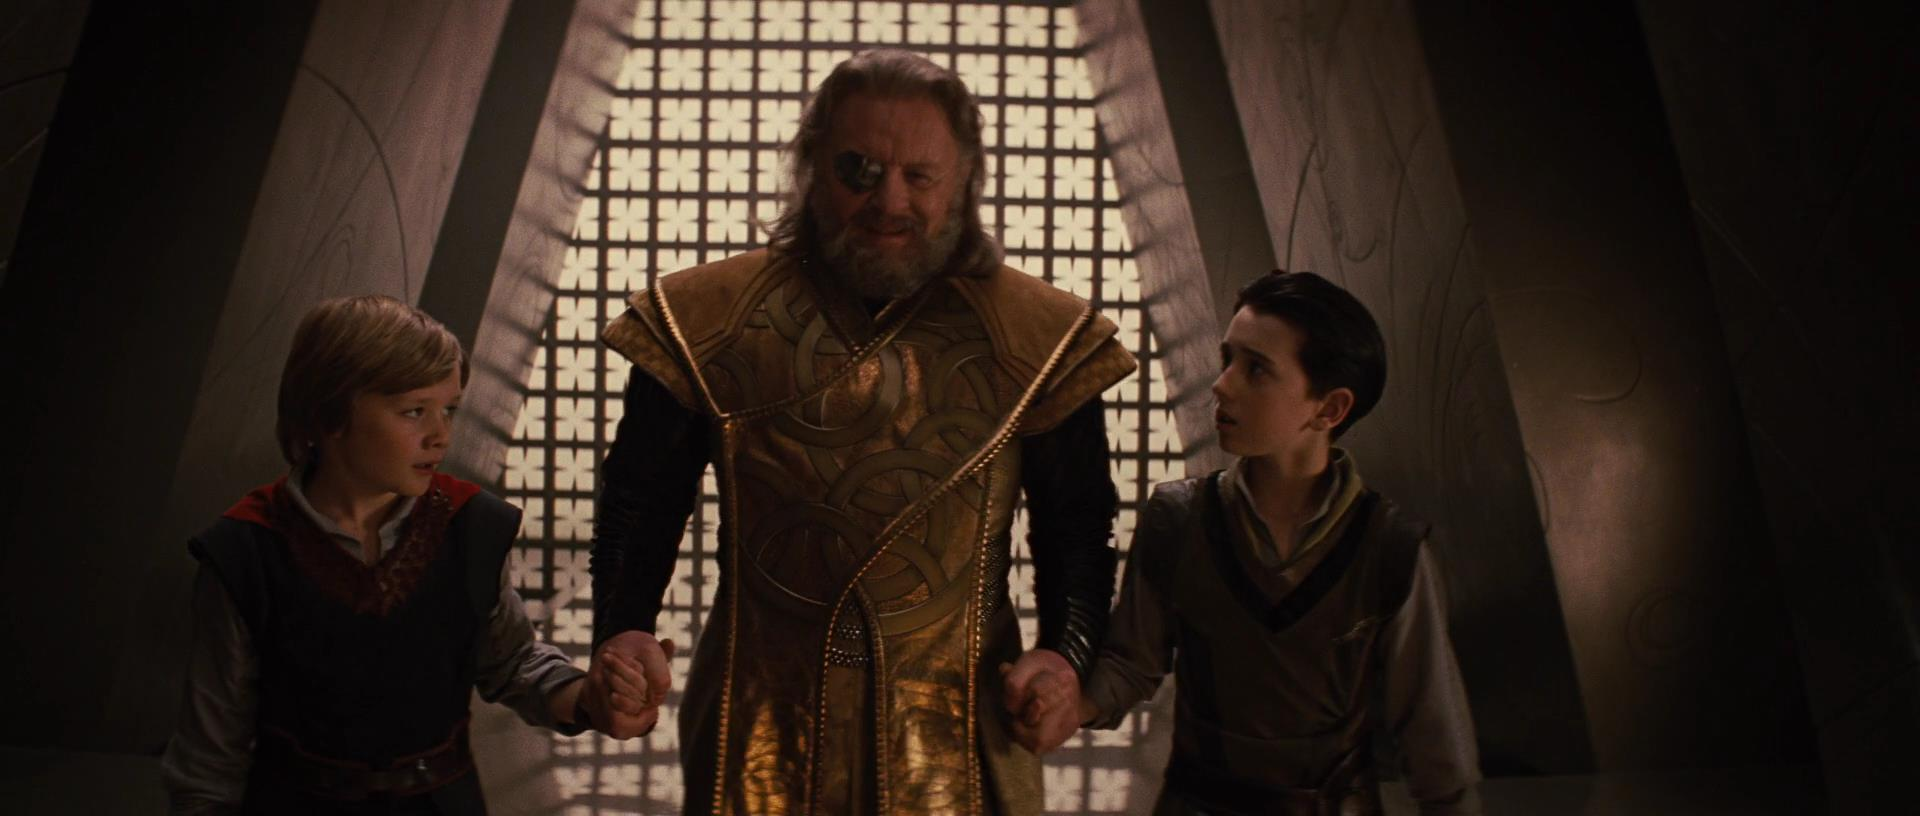 Odin-Young-Thor-Loki.jpg